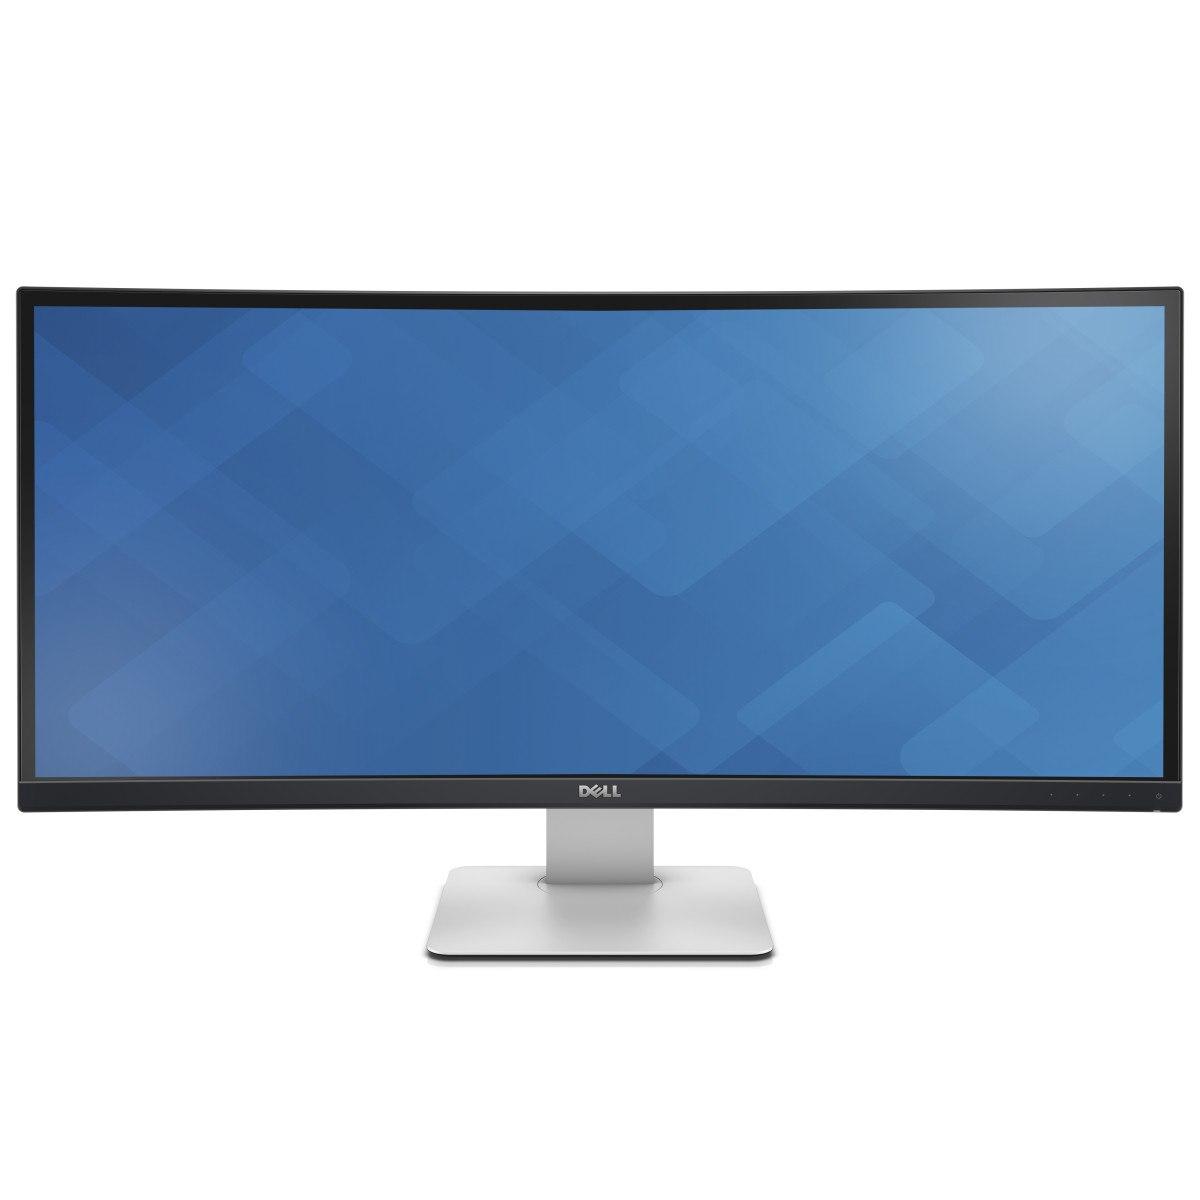 "Dell UltraSharp U3415W 86.4 cm (34"") WQHD Curved Screen LED LCD Monitor - 21:9 - Silver, Black"